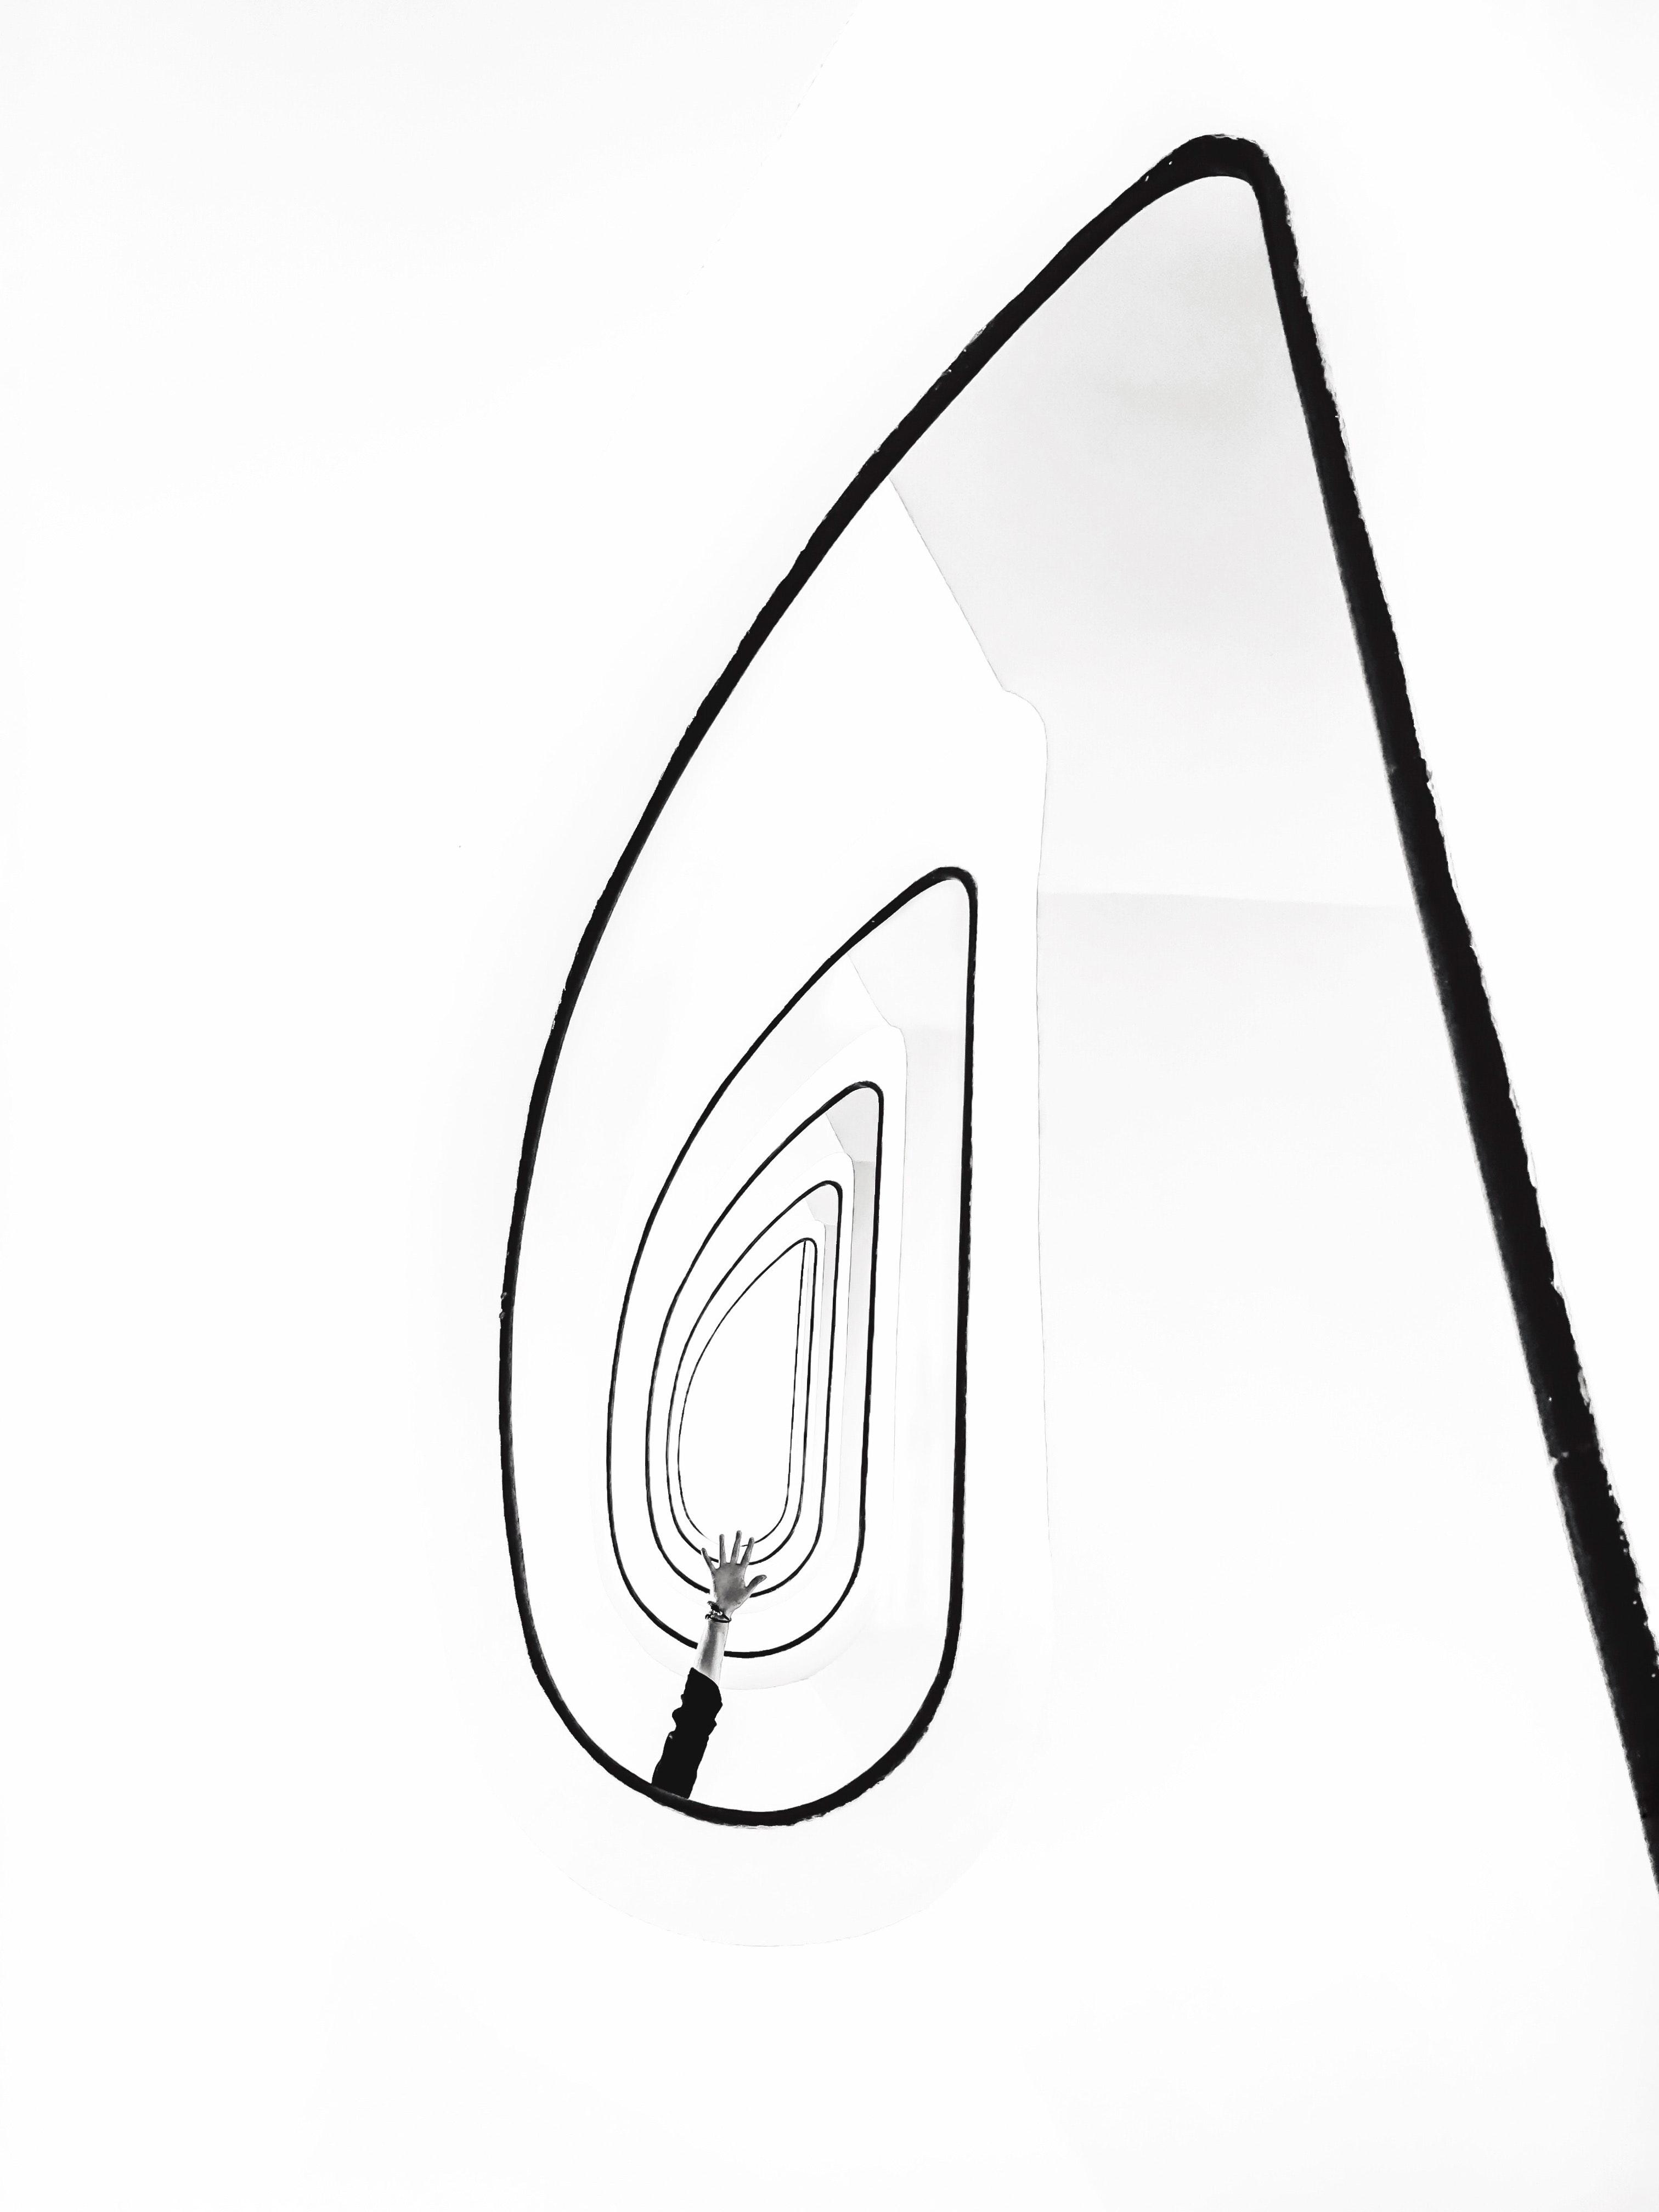 3024x4032 Free Images Black And White, Font, Automotive Design, Line